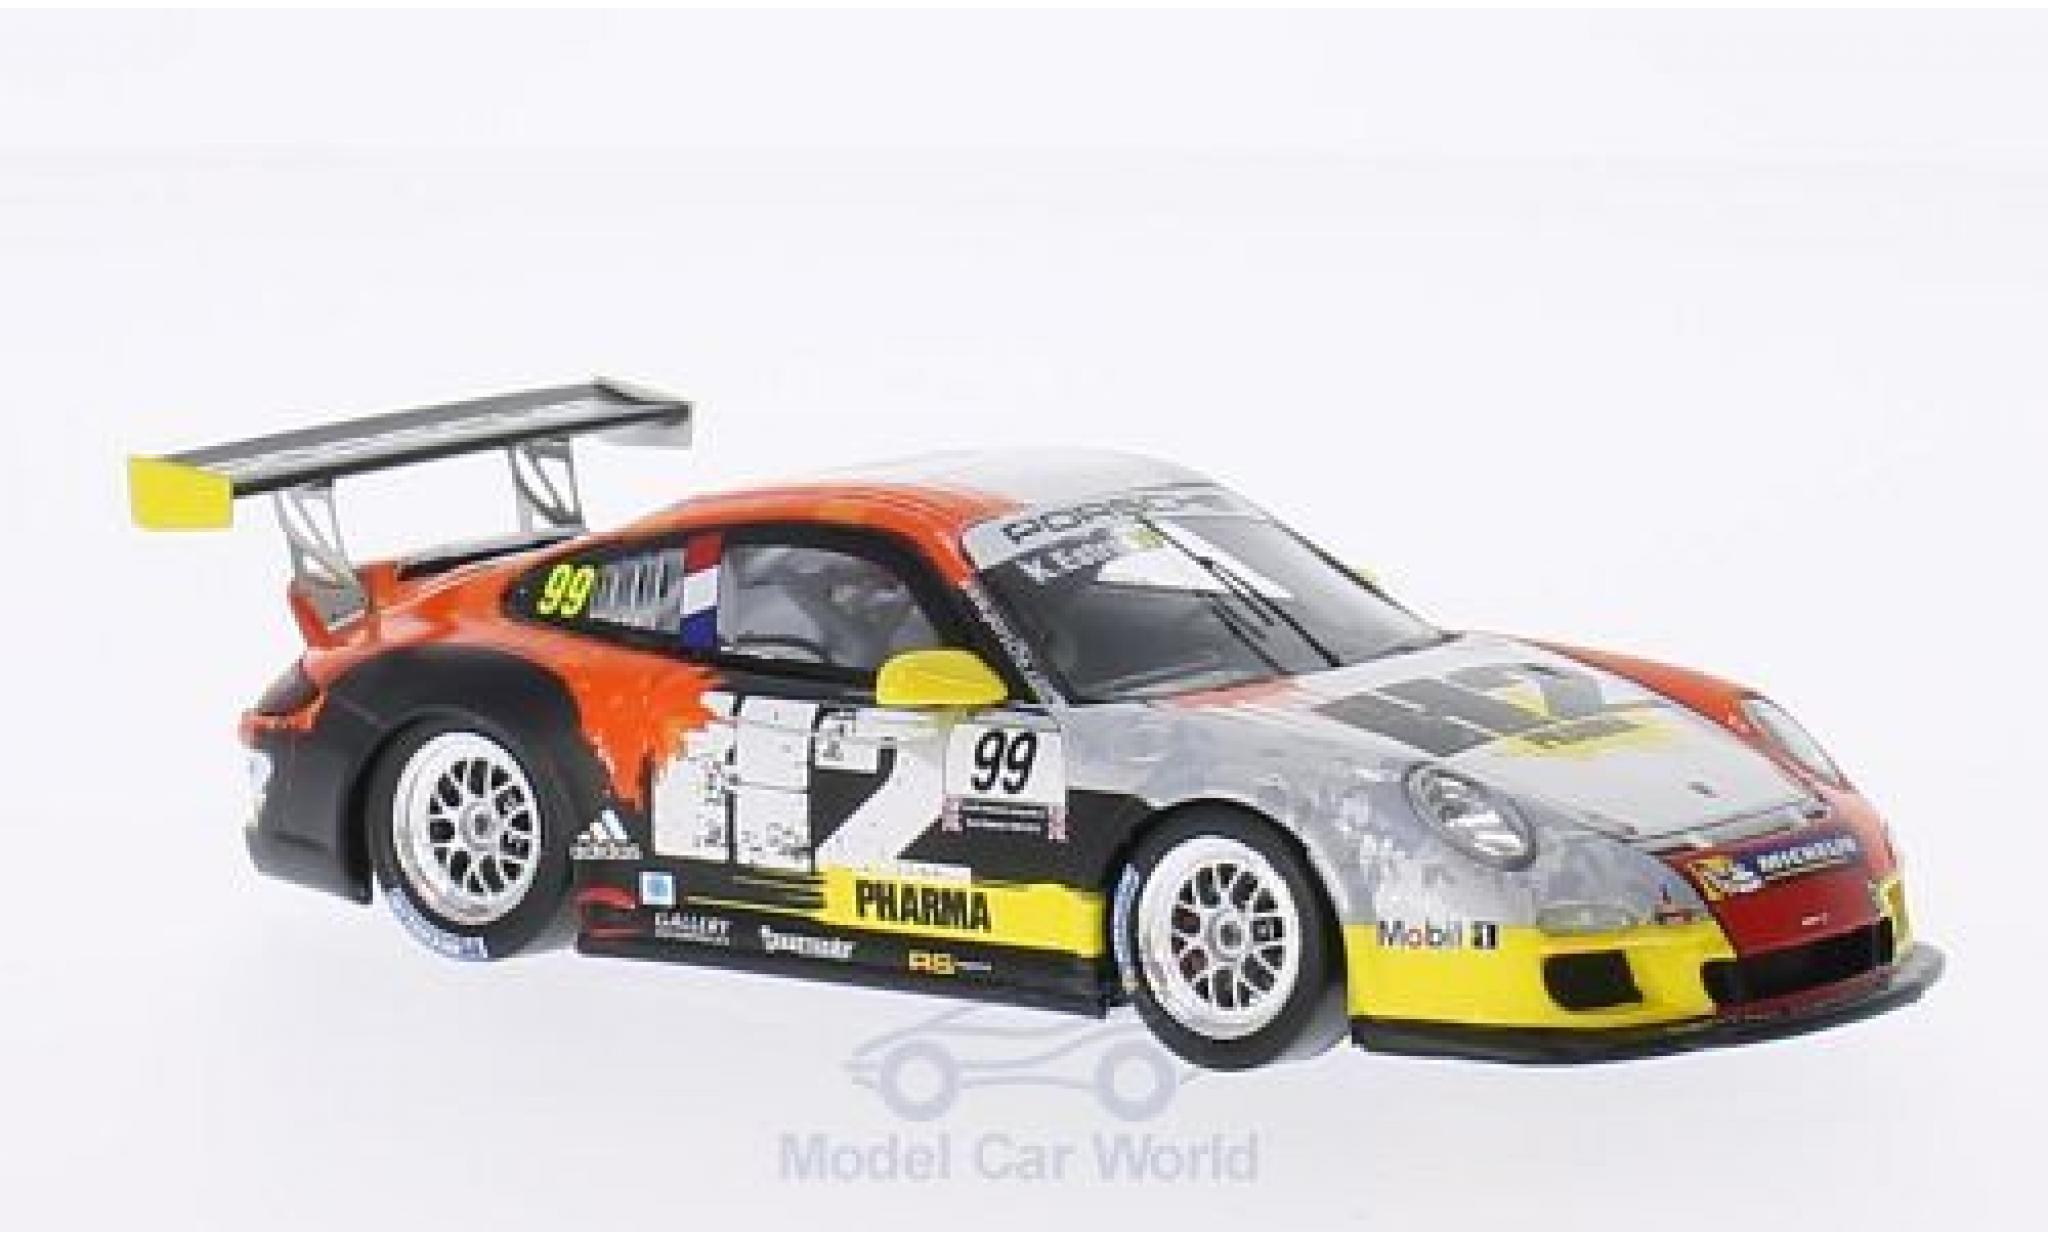 Porsche 997 GT3 CUP 1/43 Spark GT3 Cup No.99 H2 Pharma Carrera Cup Paul Ricard 2013 K.Estre